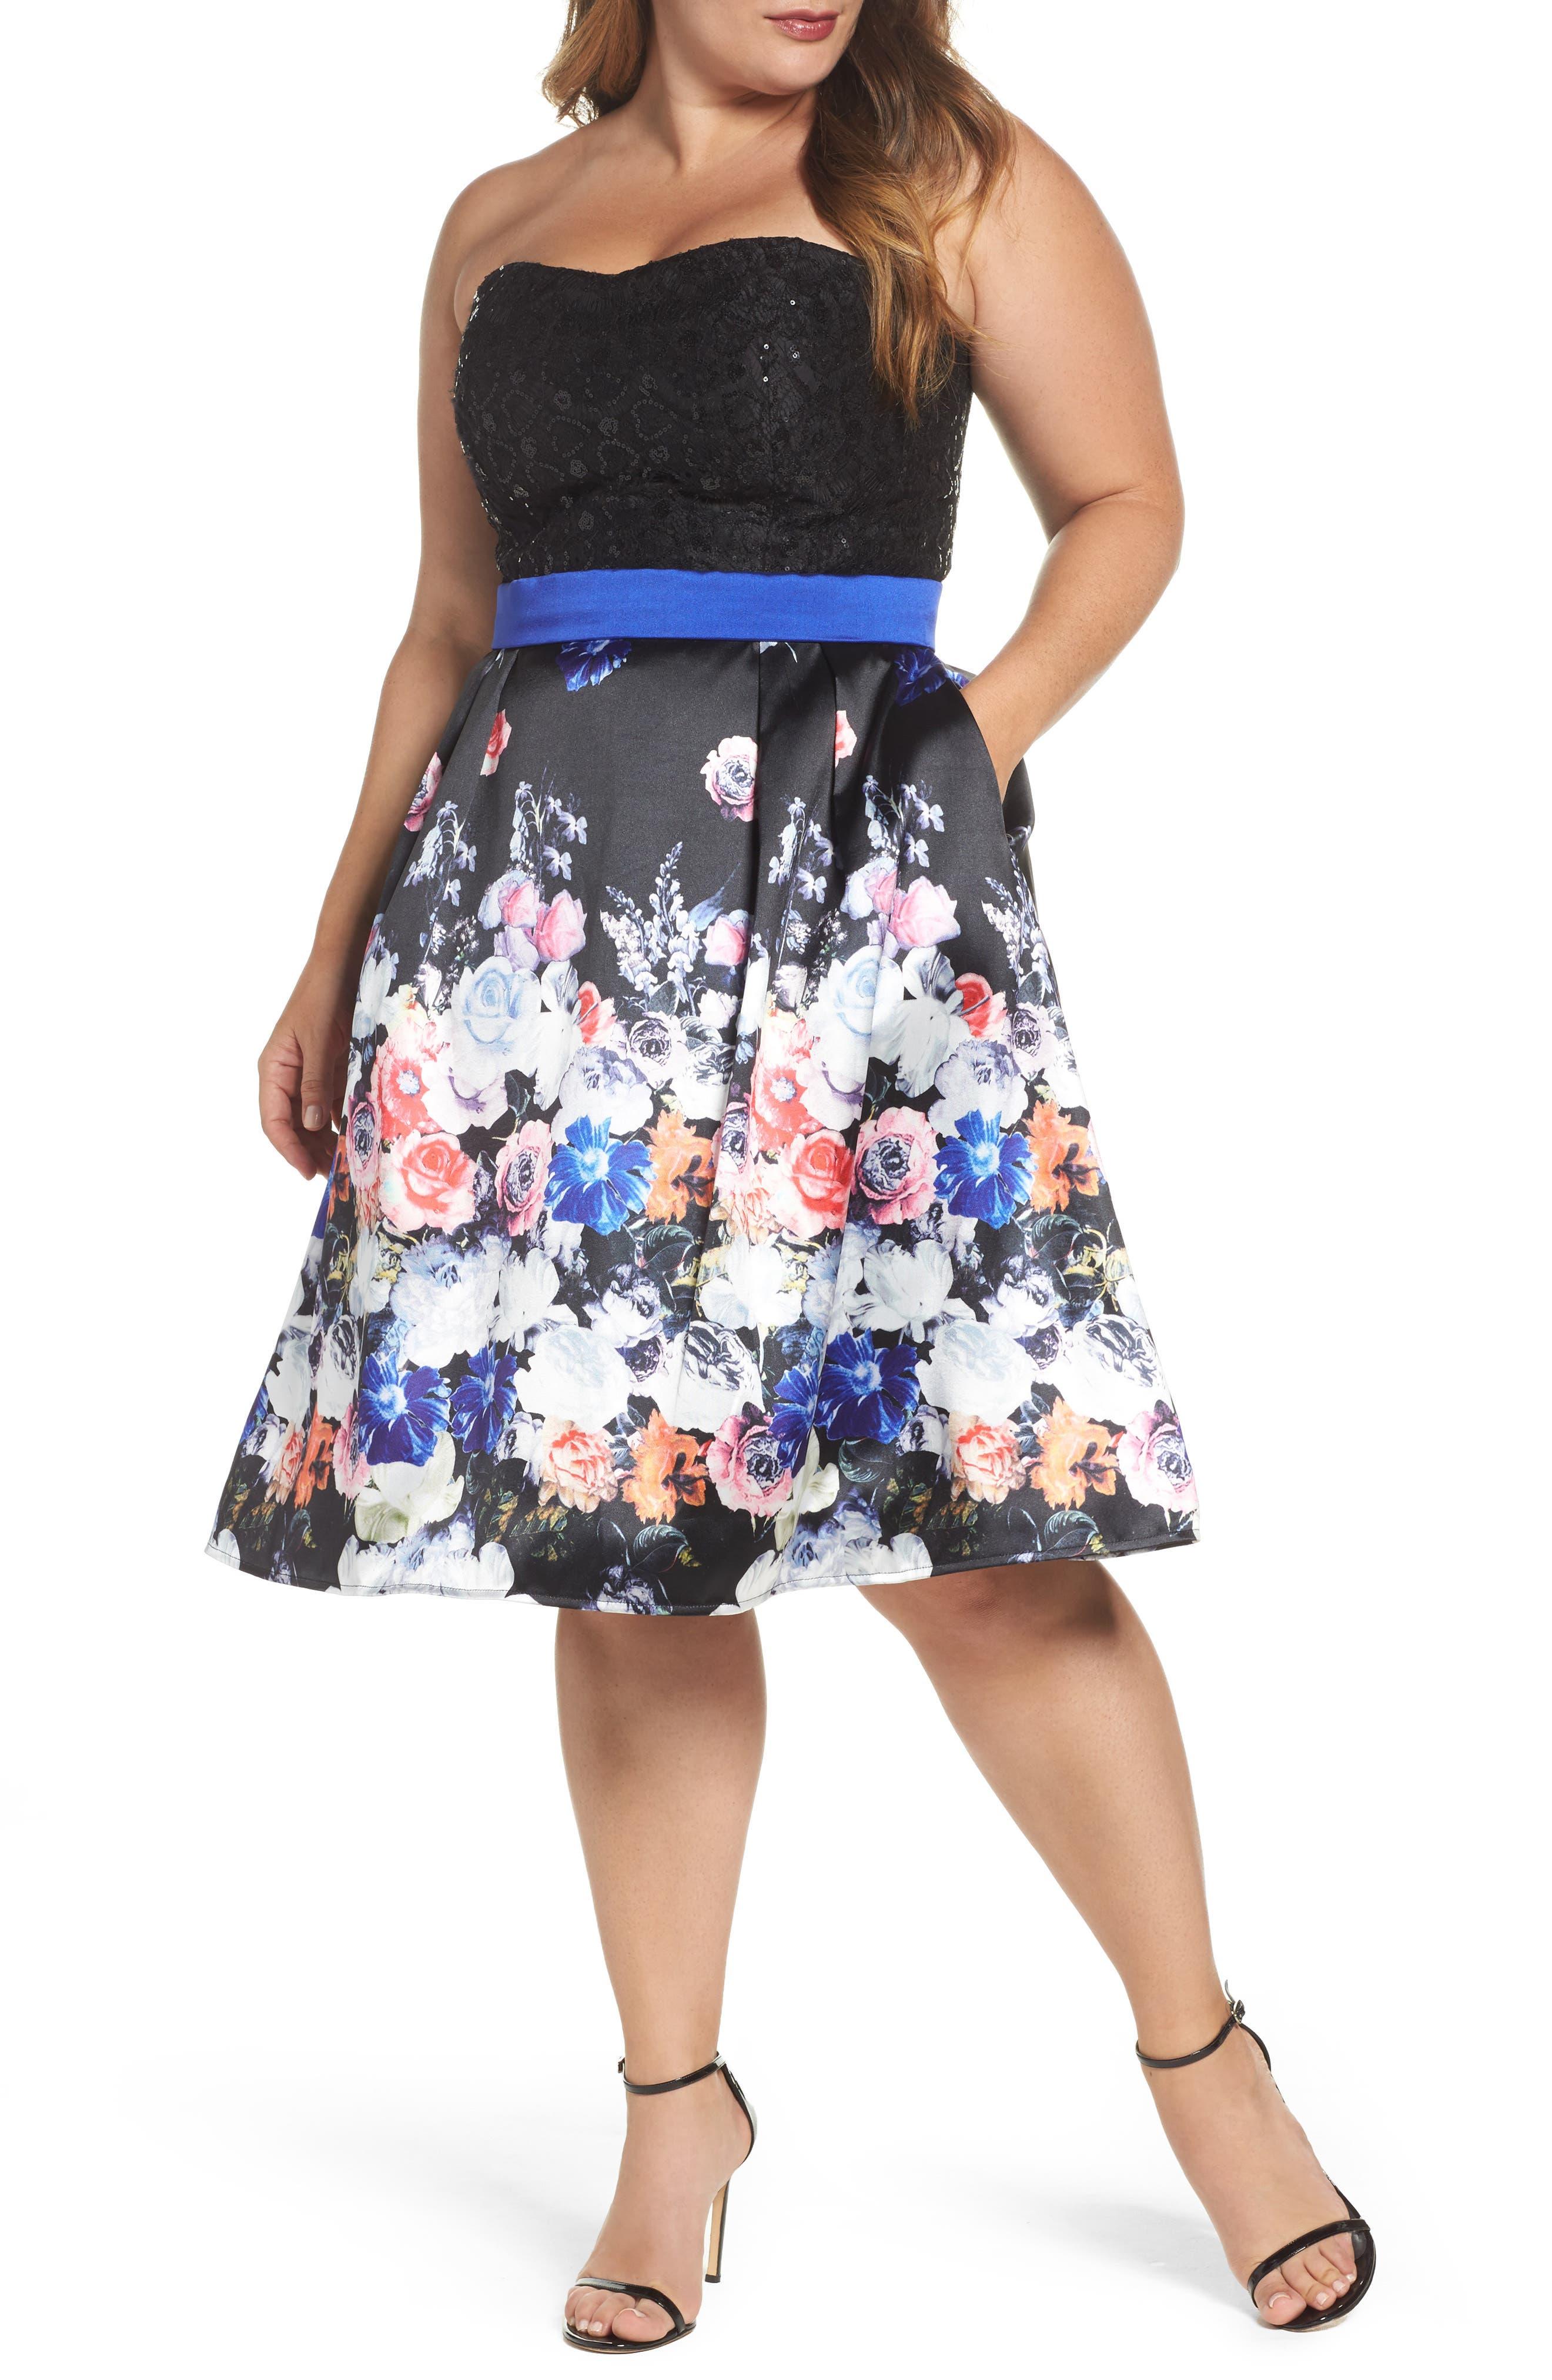 Floral Print Strapless Fit & Flare Dress,                         Main,                         color, Black/ Multi